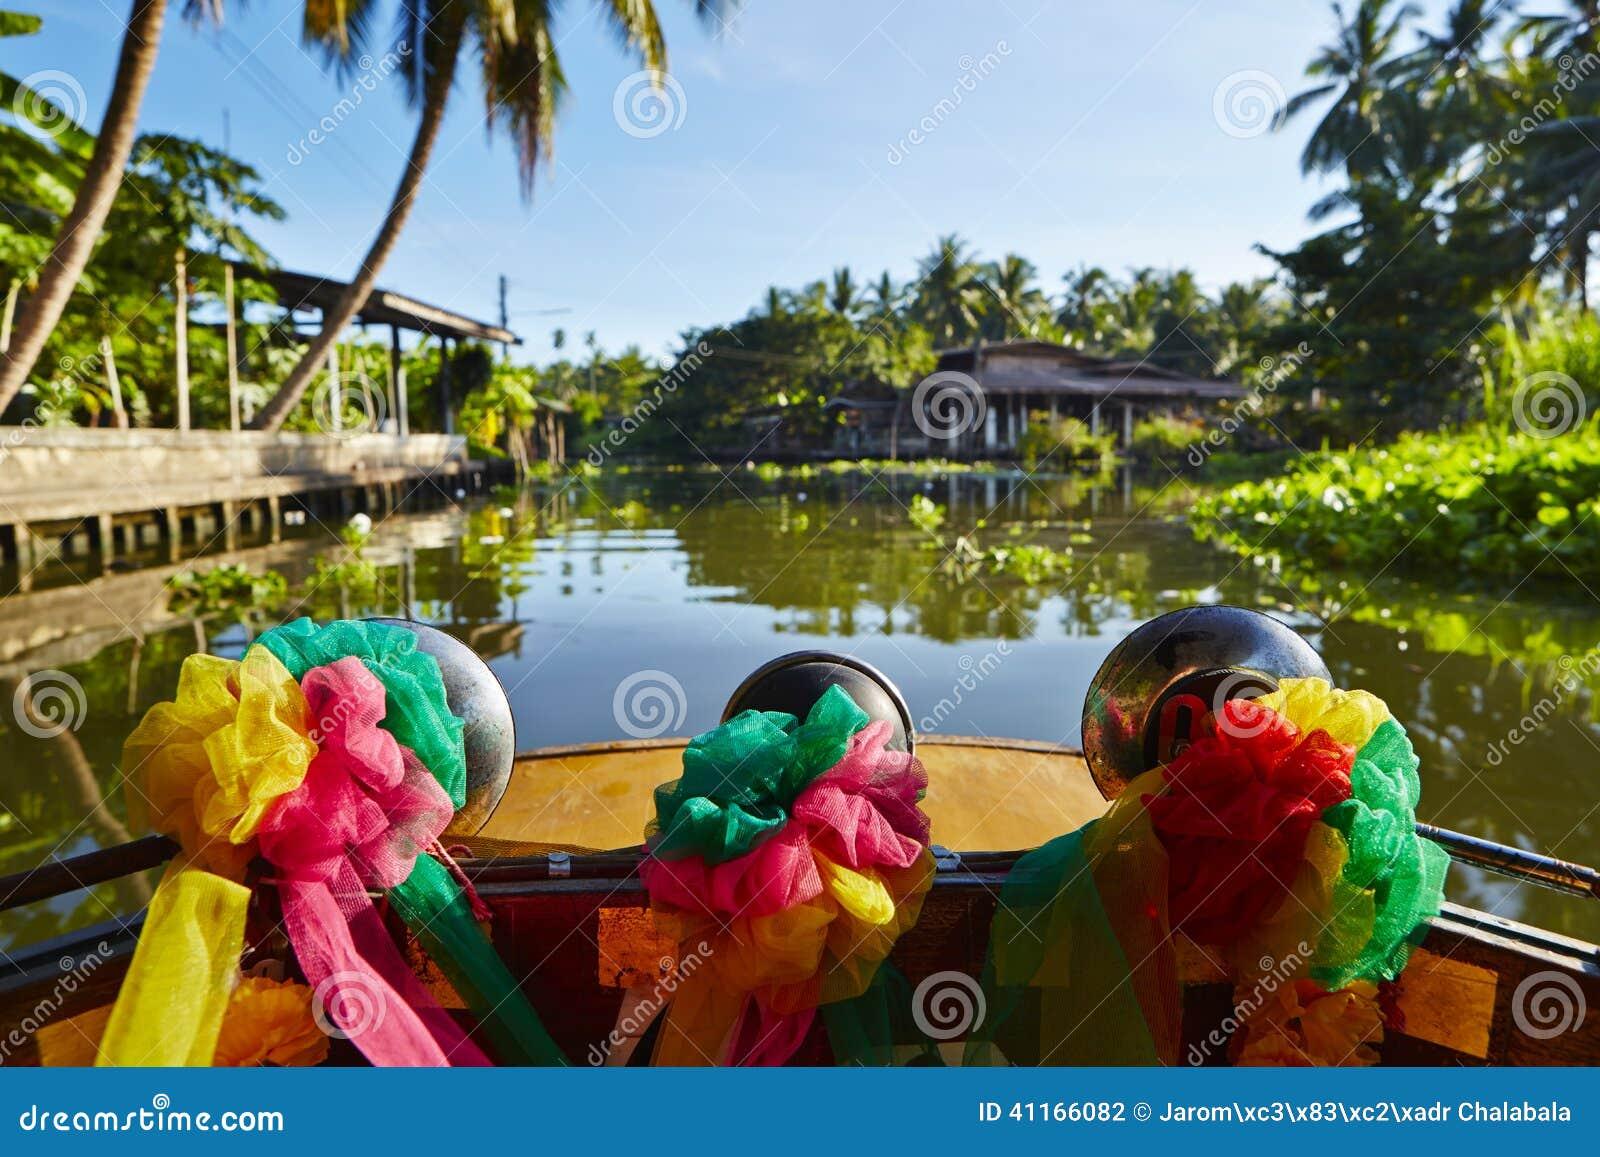 Boat Trip Stock Photo - Image: 41166082